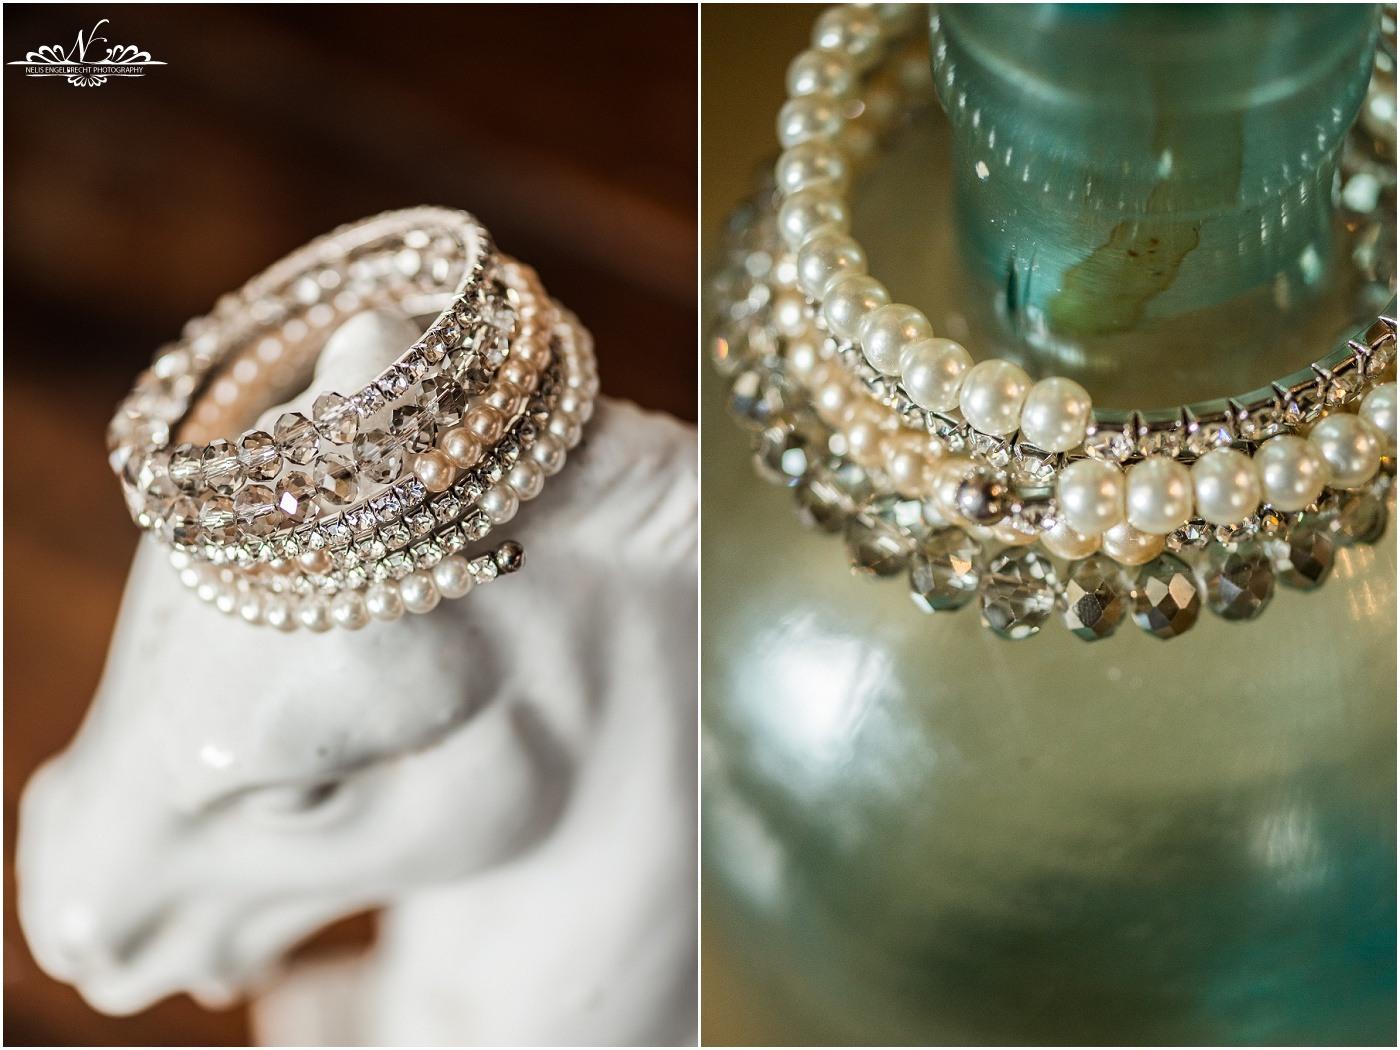 Eensgezind-Wedding-Photos-Nelis-Engelbrecht-Photography-020